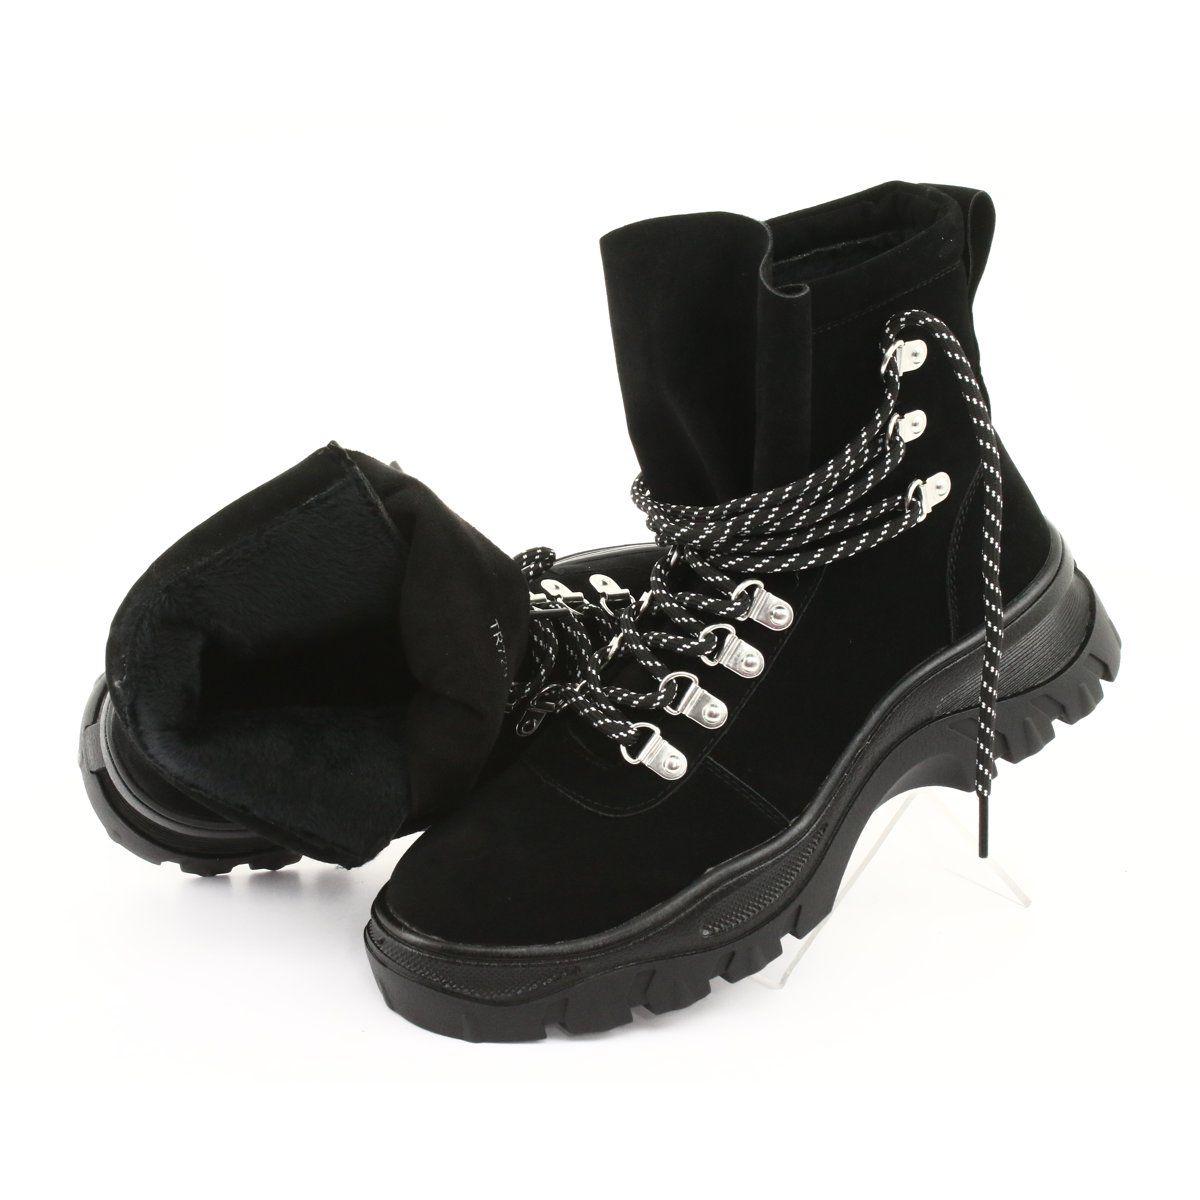 Traperki Wiazane Czarne Sergio Leone Tr729 Winter Shoes Nubuck Leather Timberland Boots